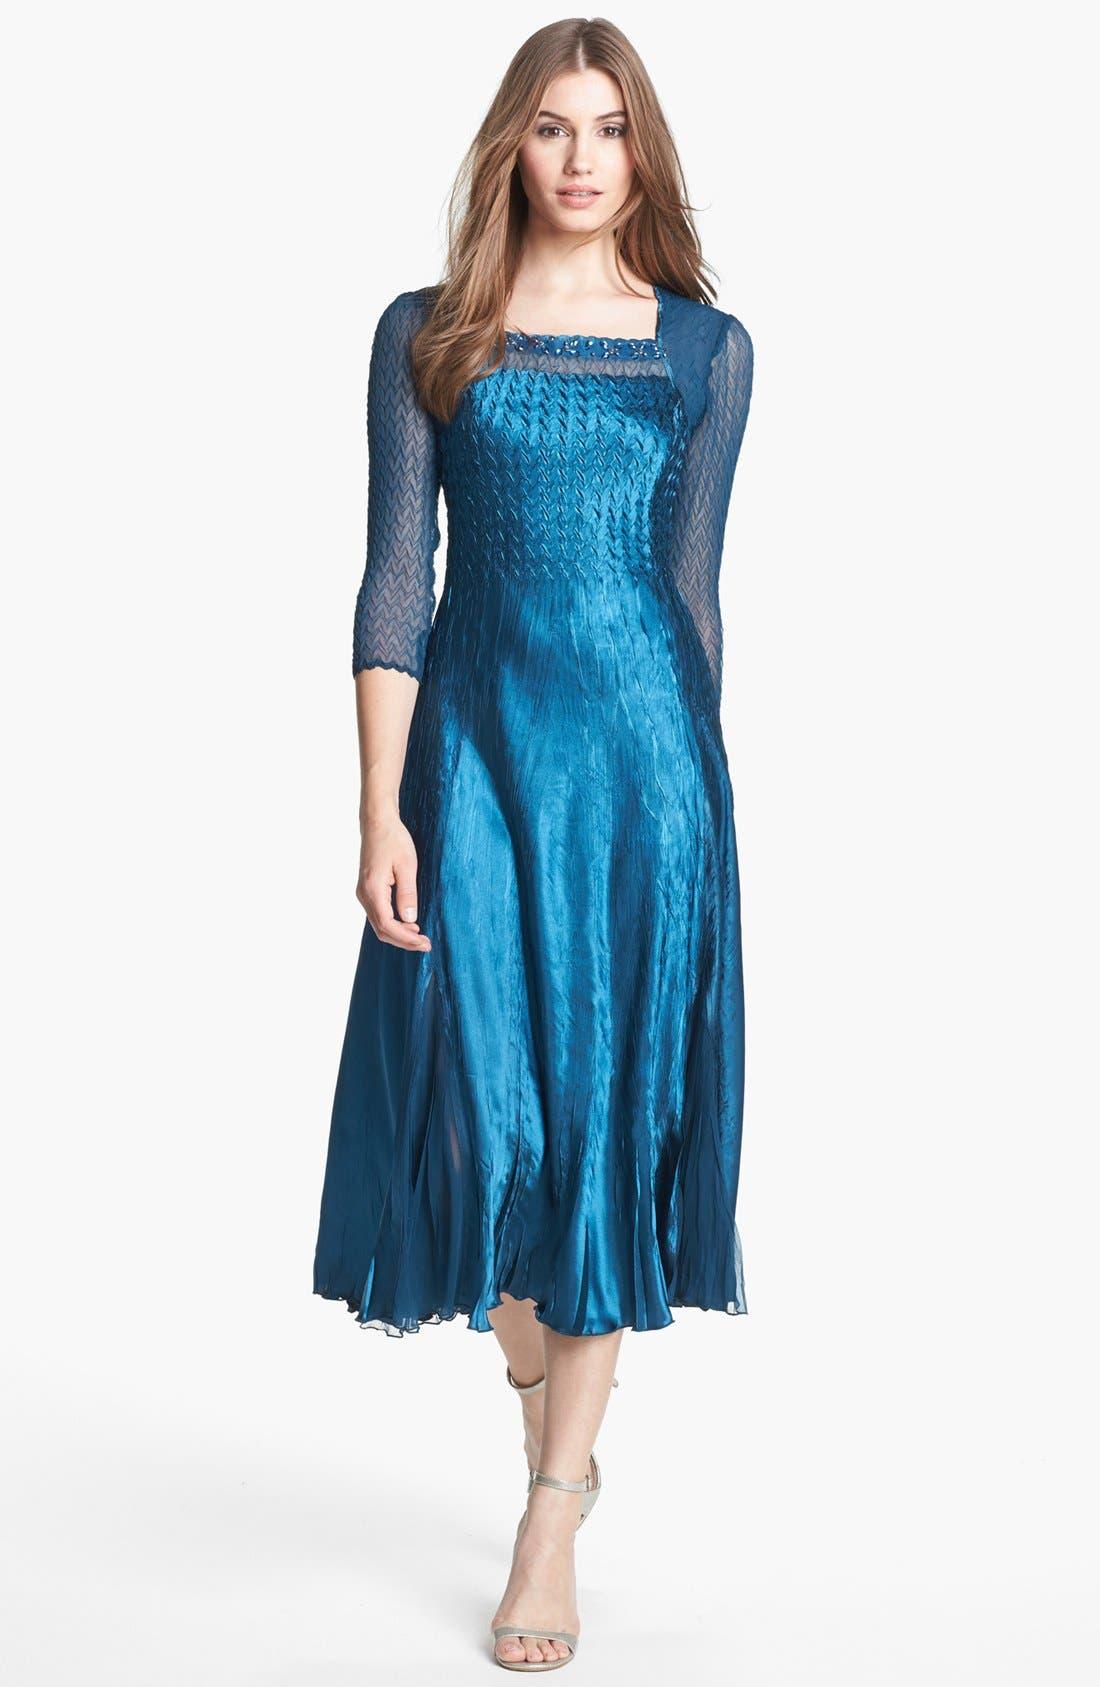 Alternate Image 1 Selected - Komarov Sheer Sleeve Textured Charmeuse Dress